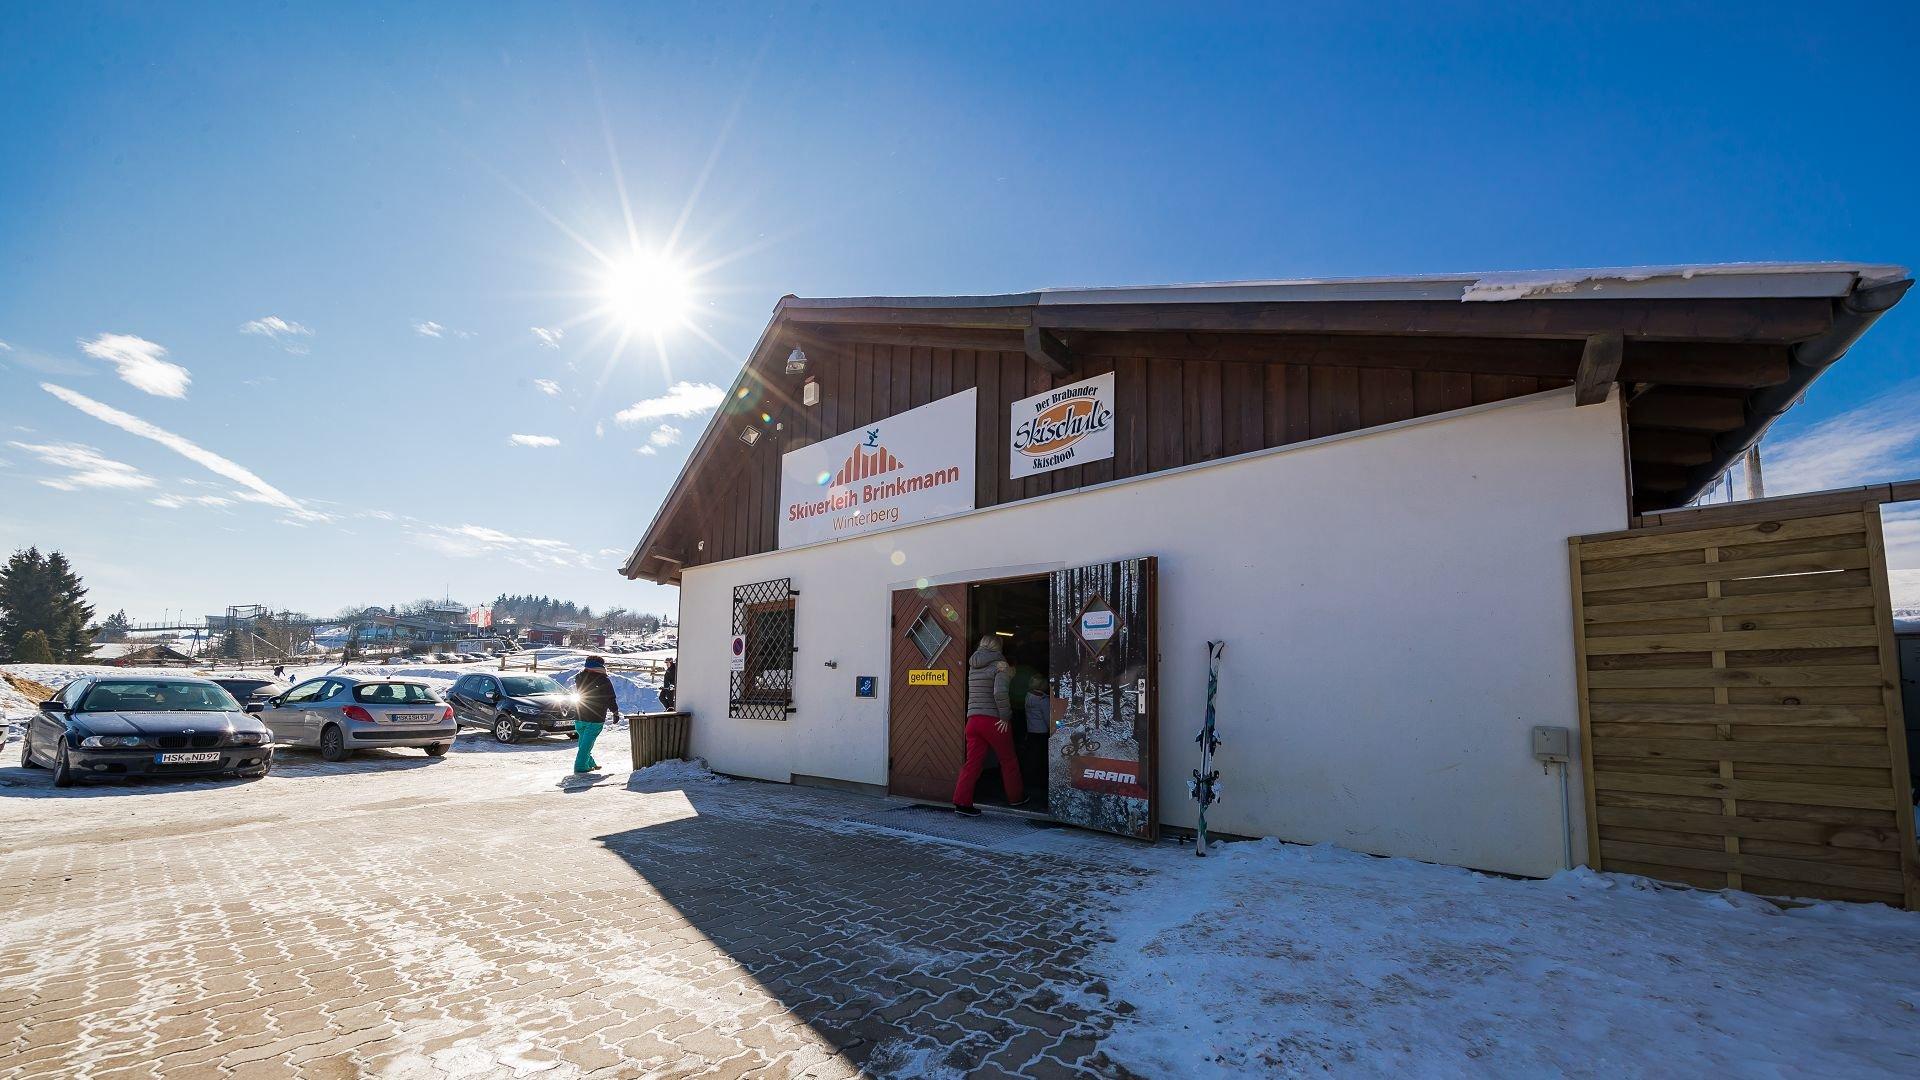 Skiverleih Brinkmann - Filiale 1 - Skigebiet Kappe - Kapperundweg 3